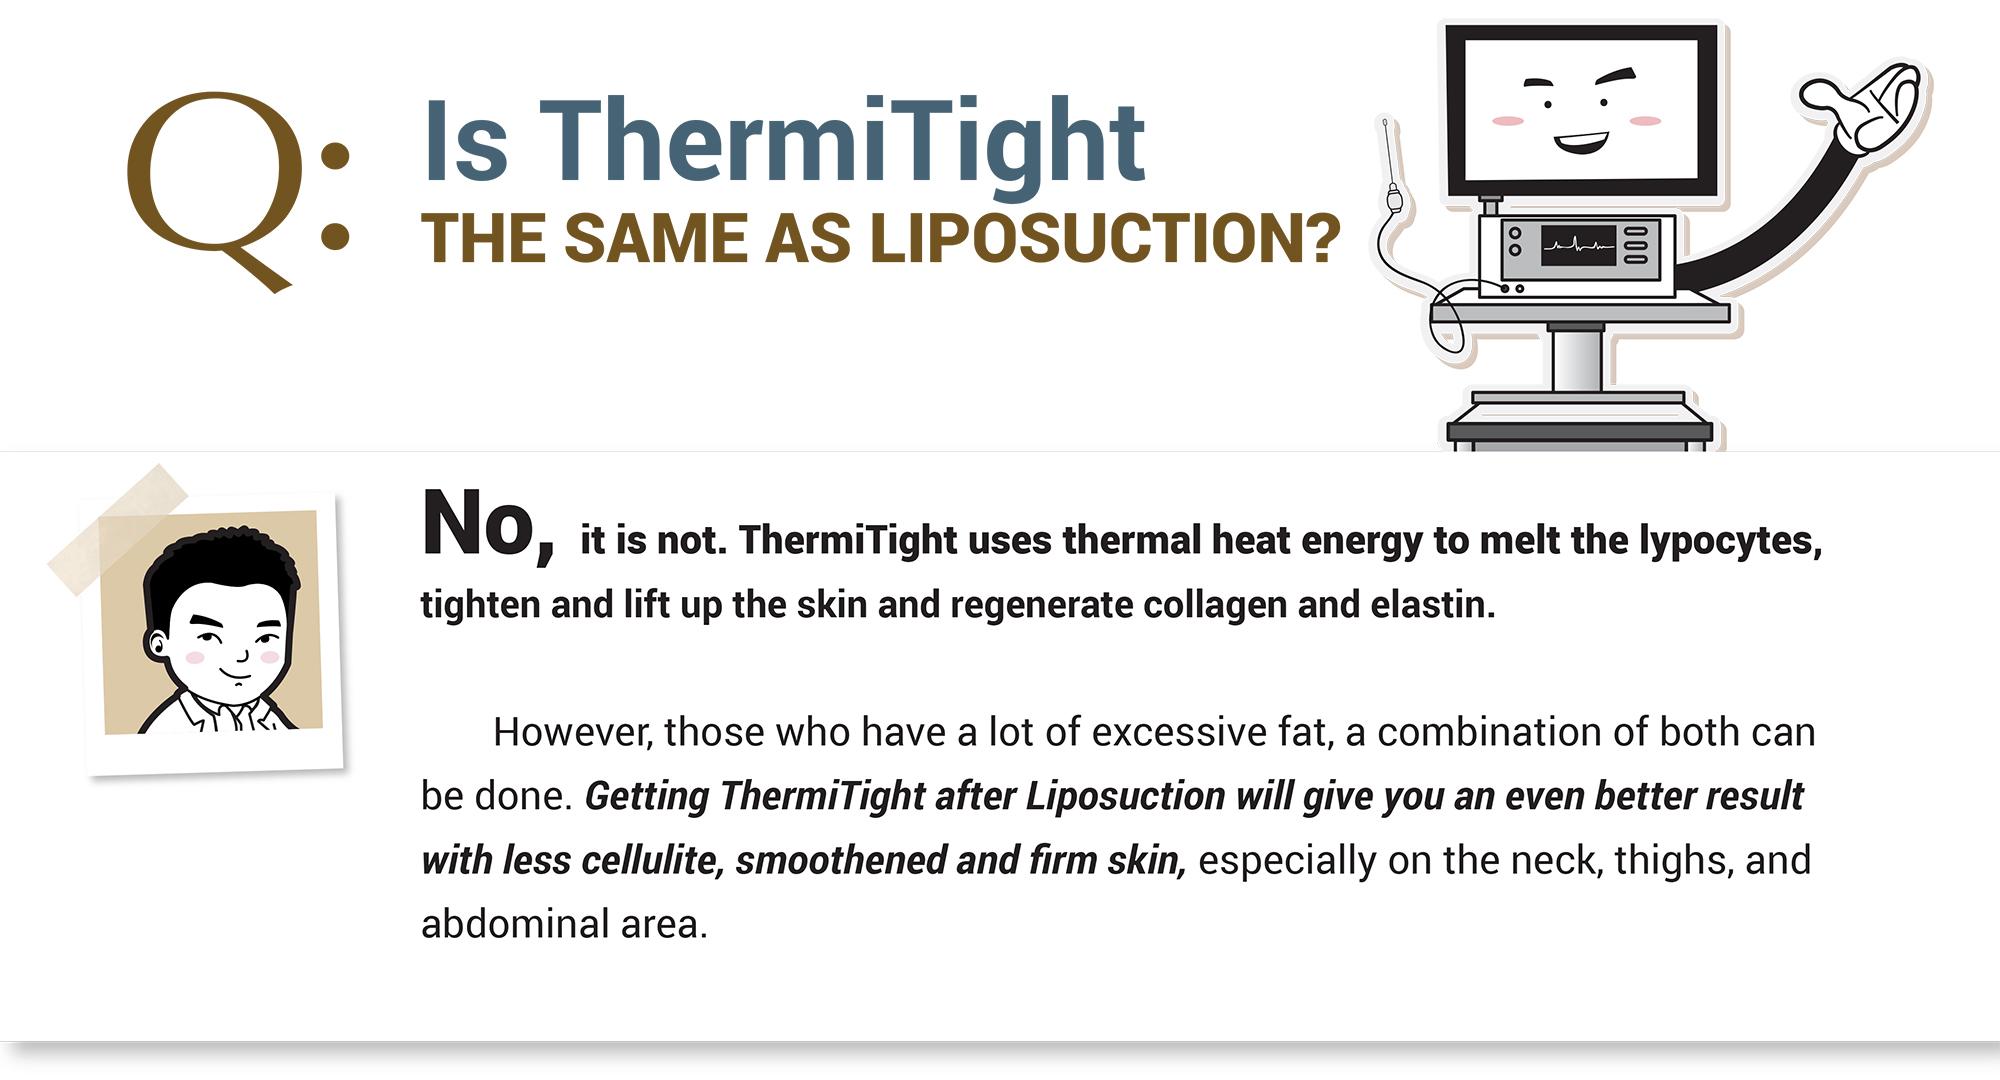 Q&A ThermiTight